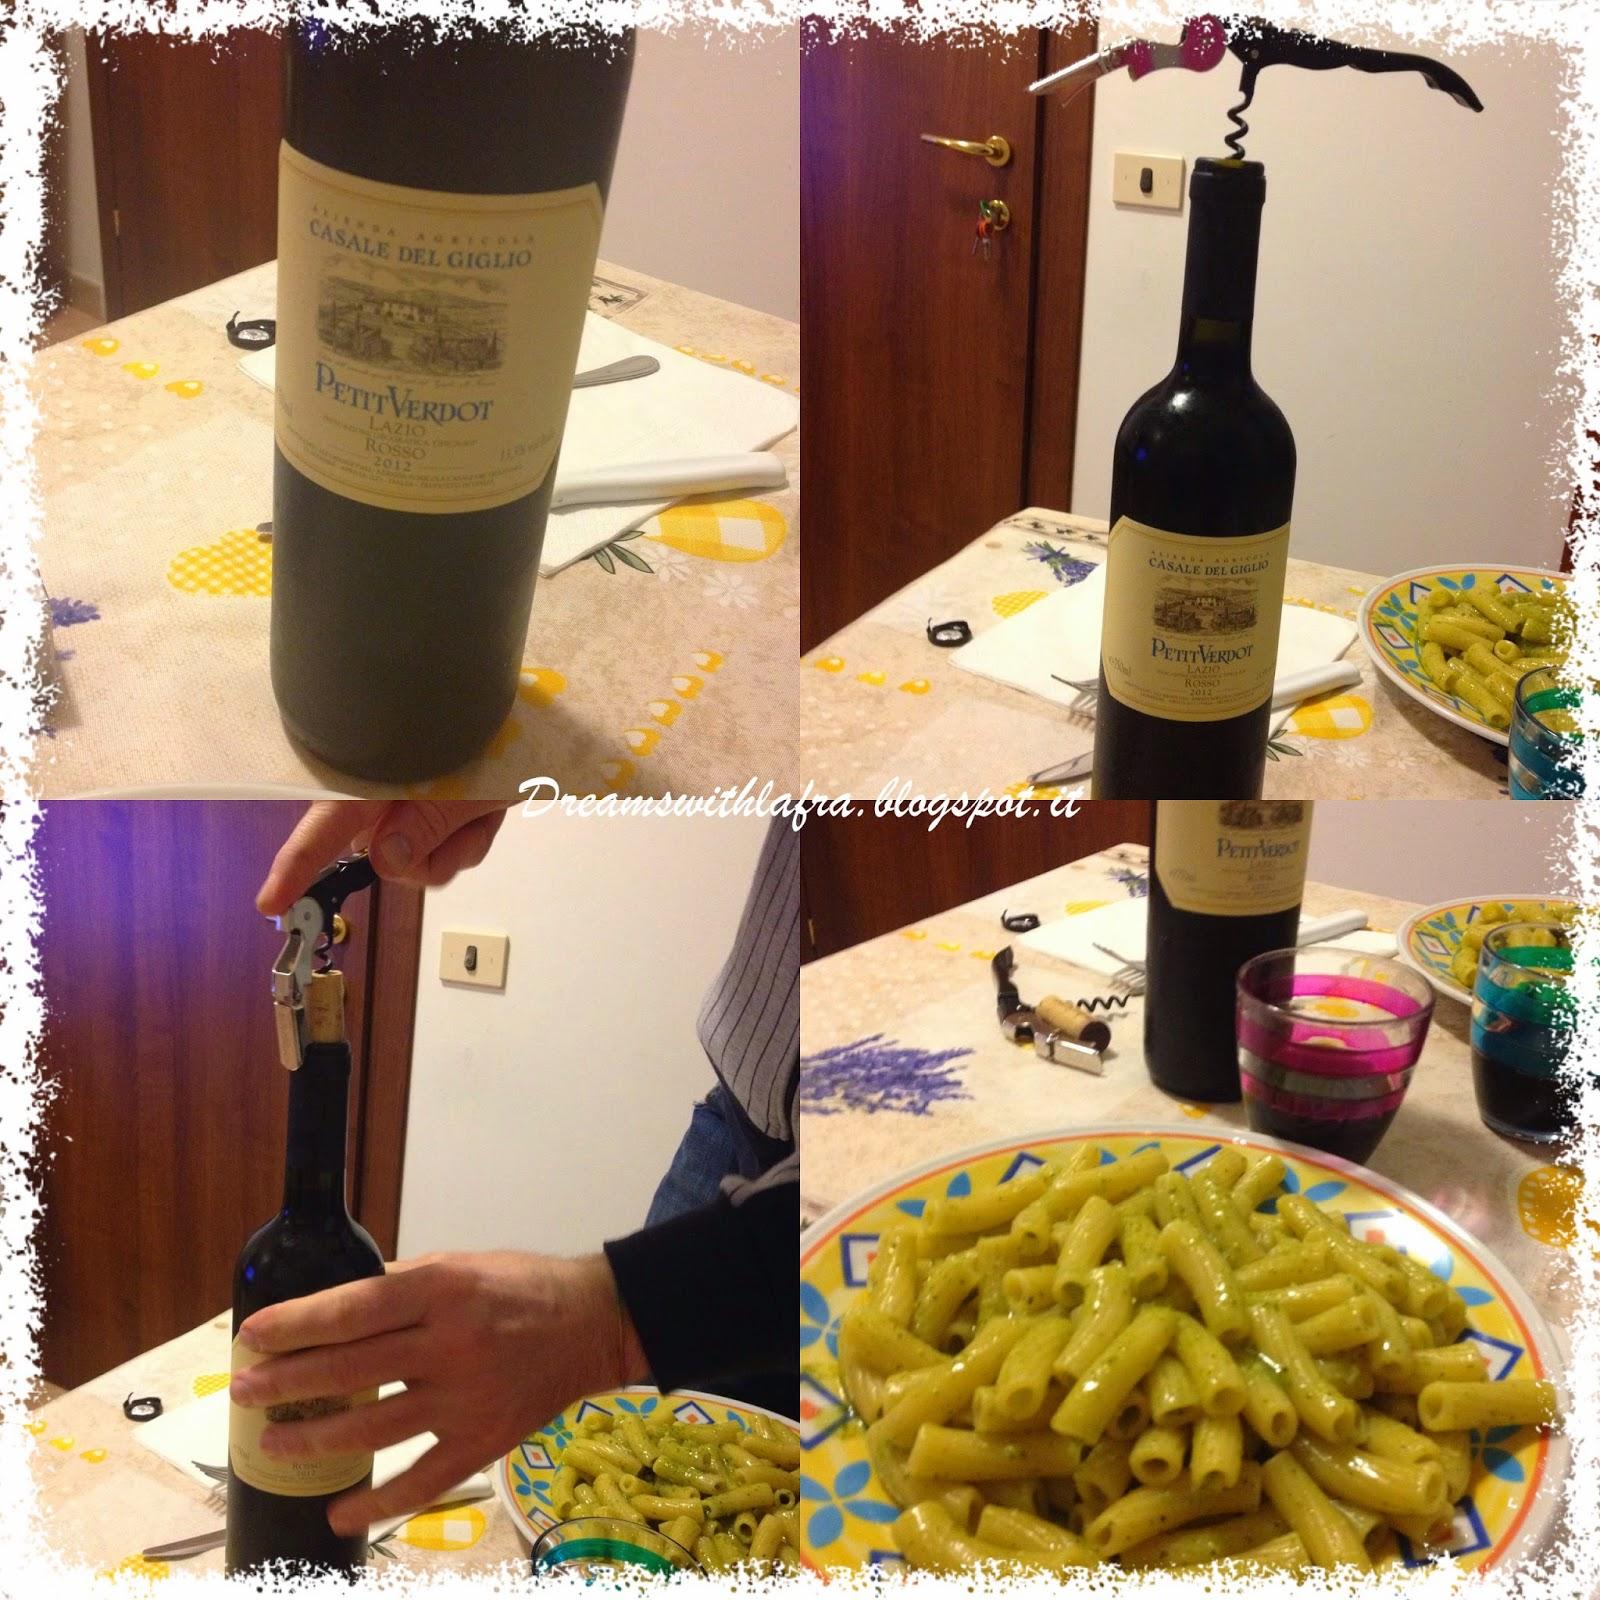 http://www.casaledelgiglio.it/petit-verdot/